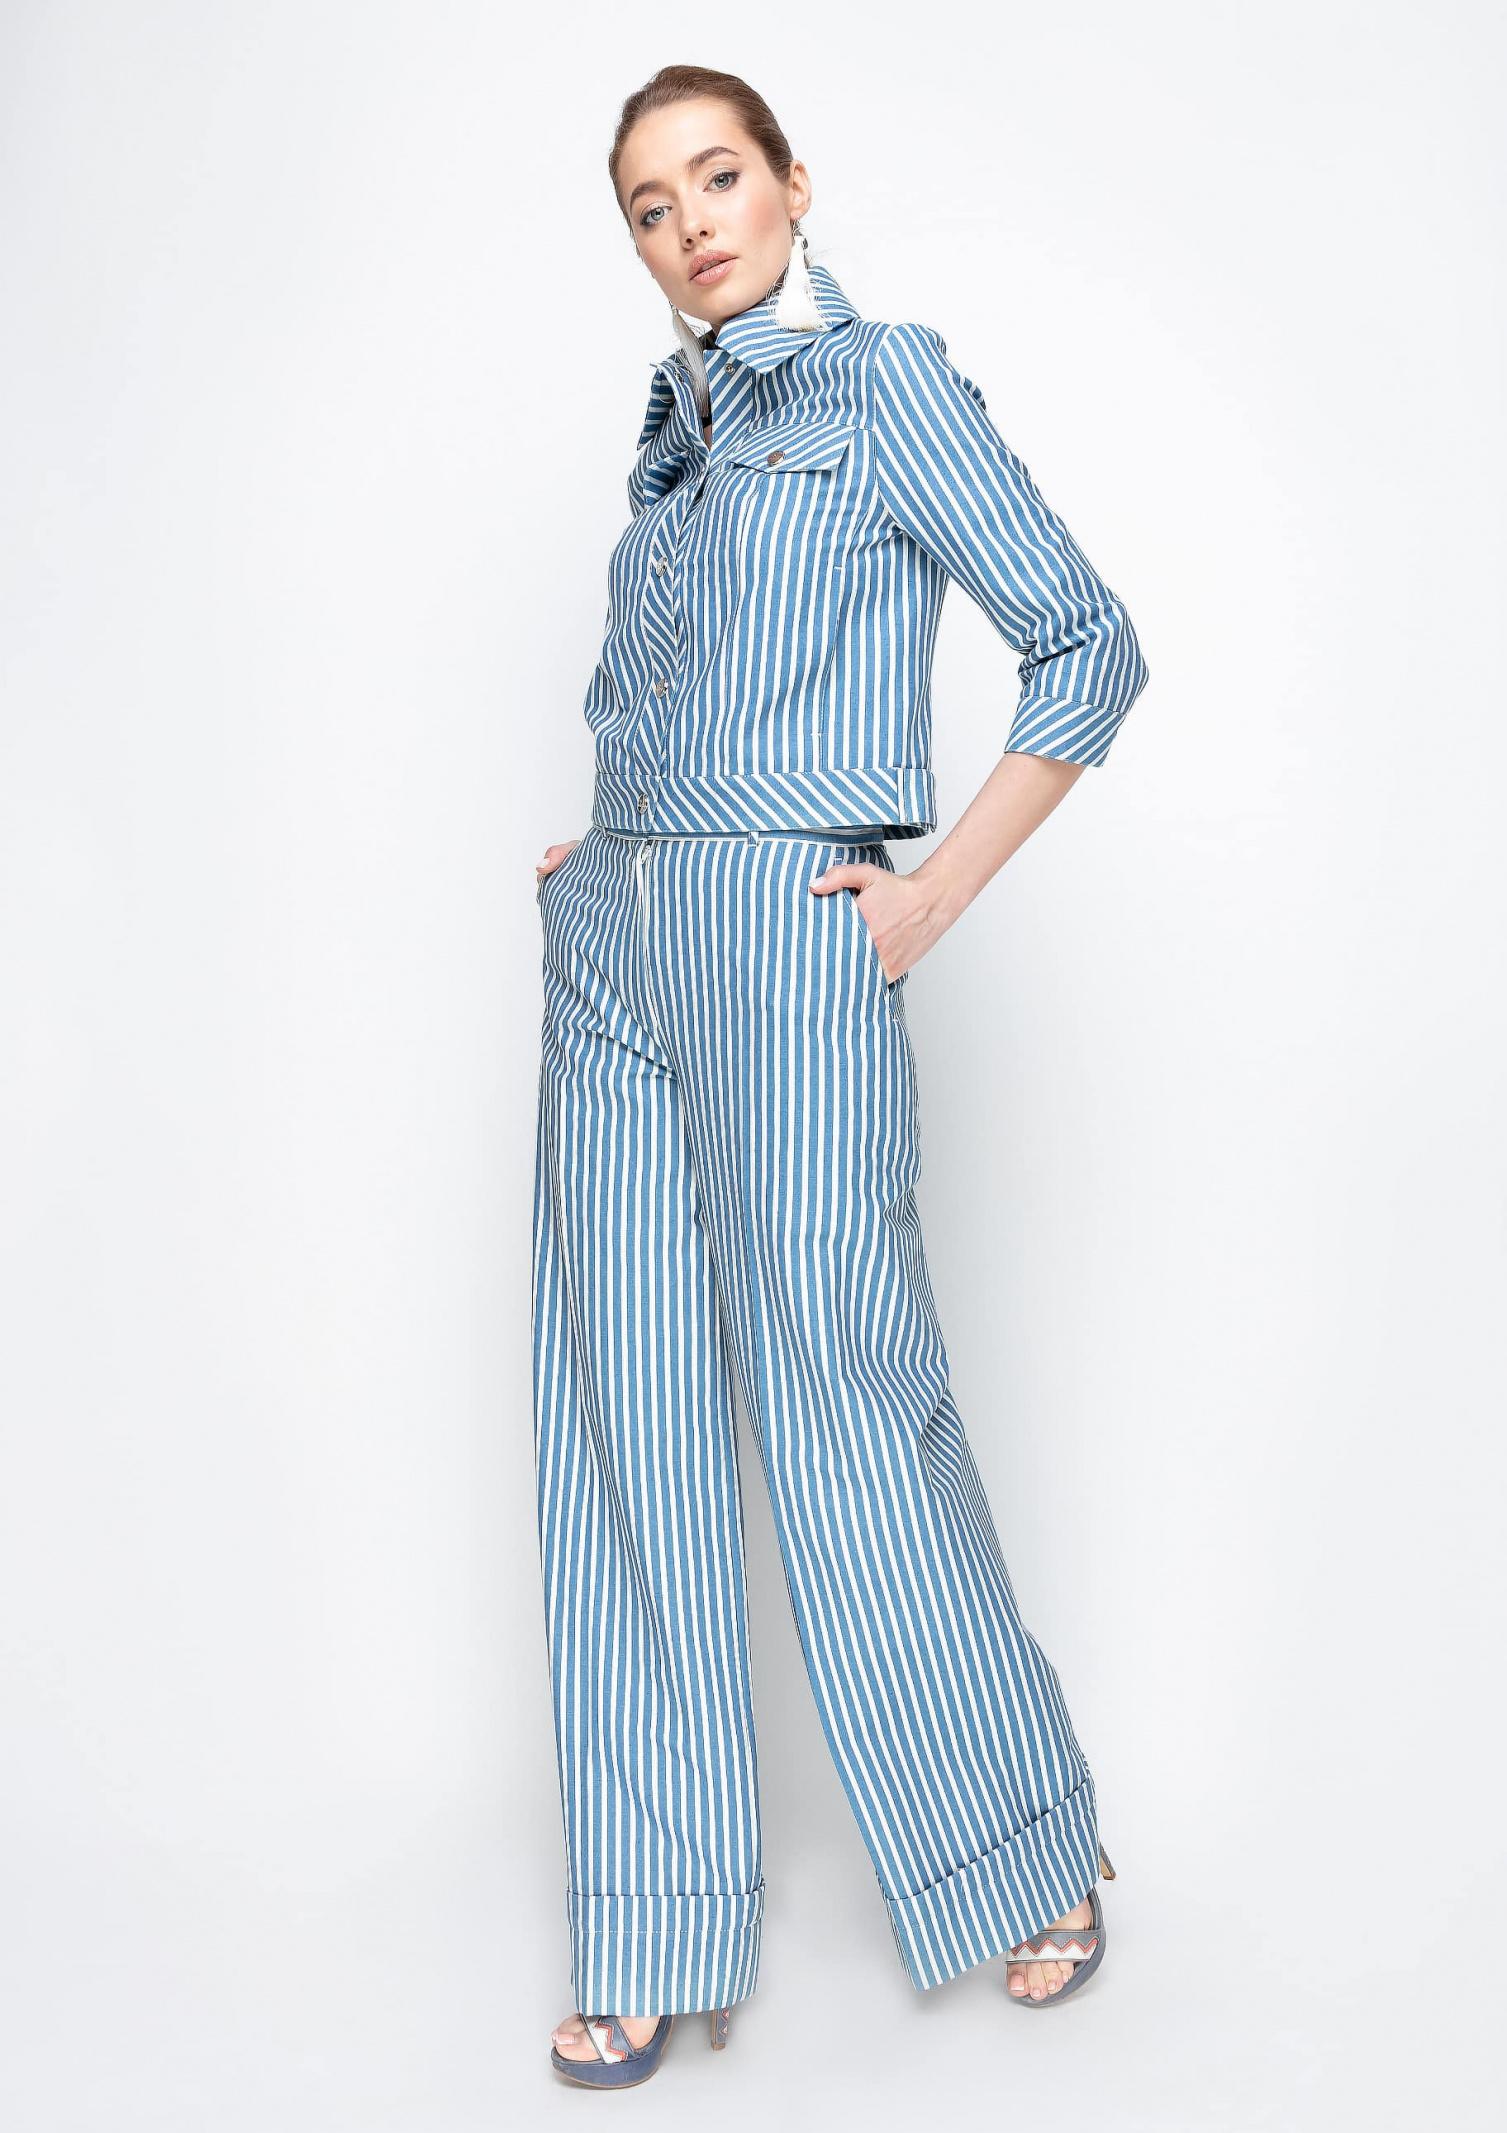 Нижнее белье женские Emporio Armani модель 163179-8P201-10270 цена, 2017